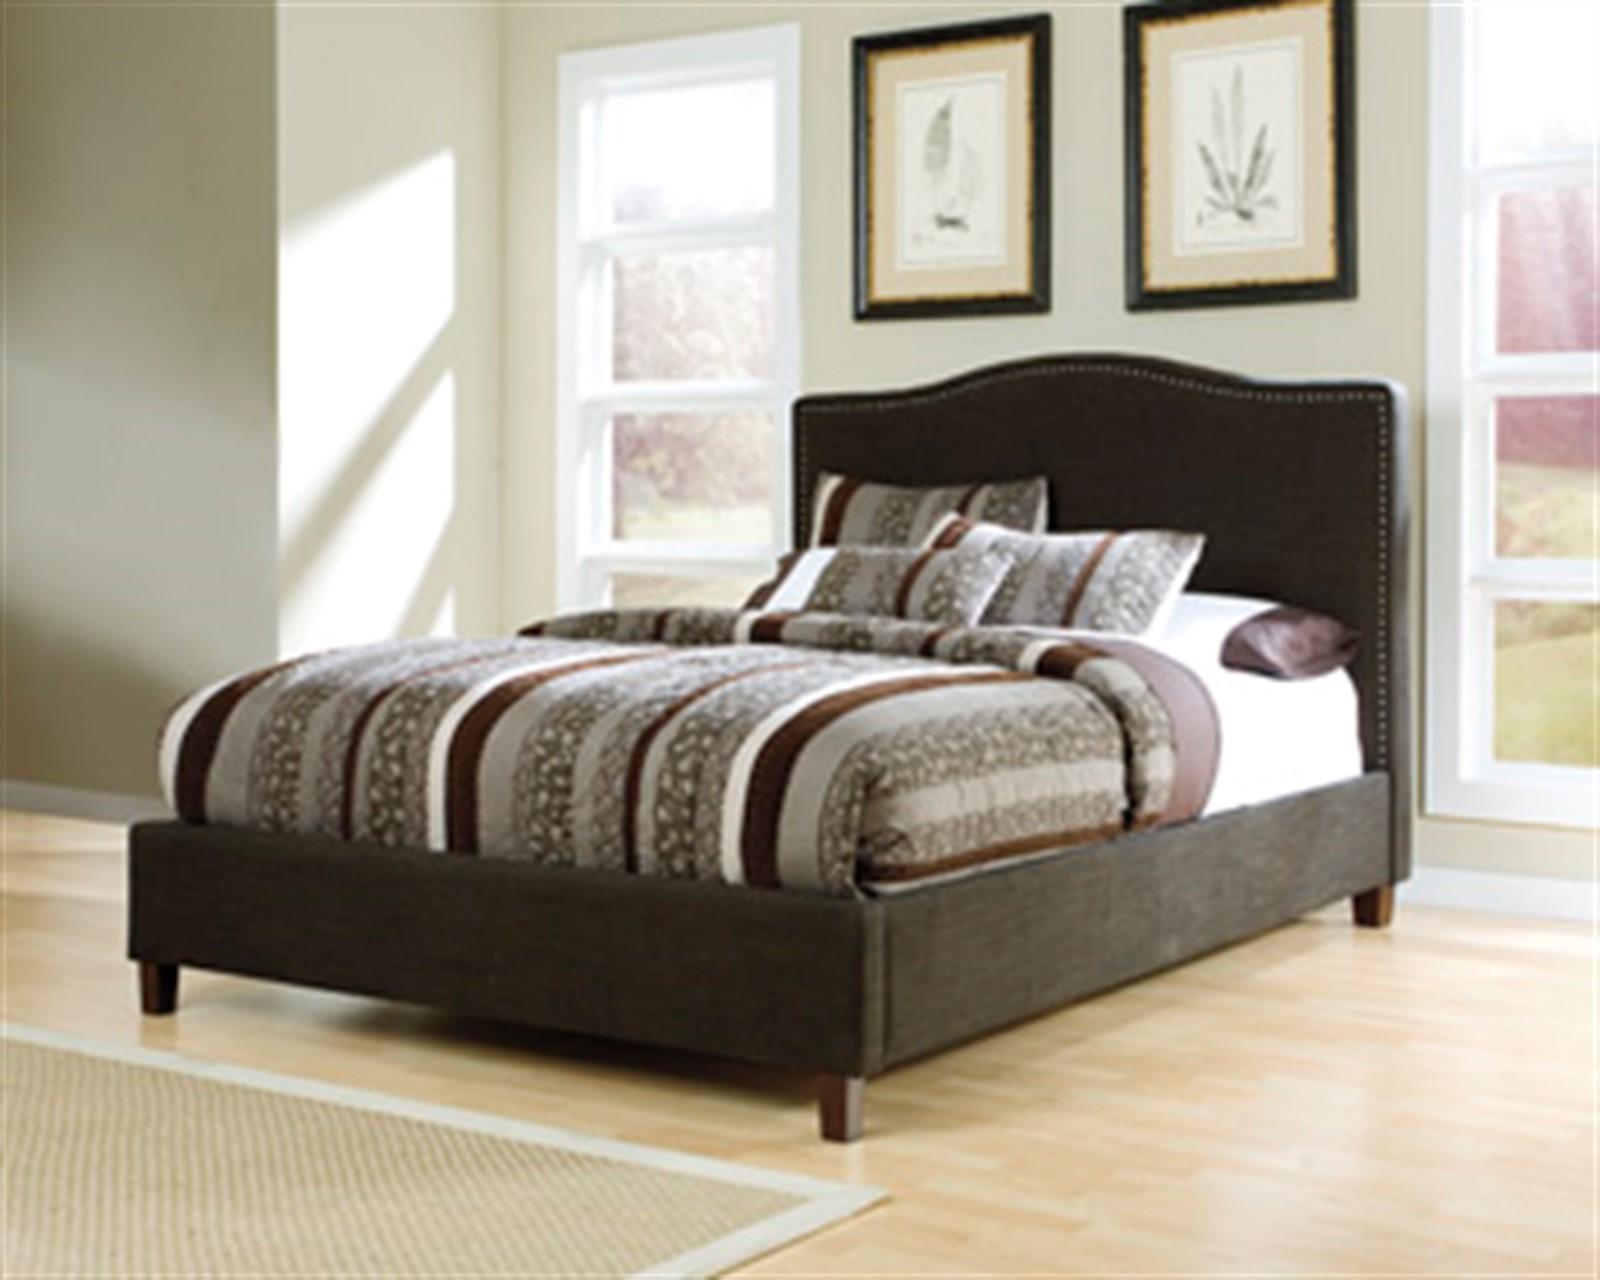 Kasidon Dark Brown Upholstered King Bed